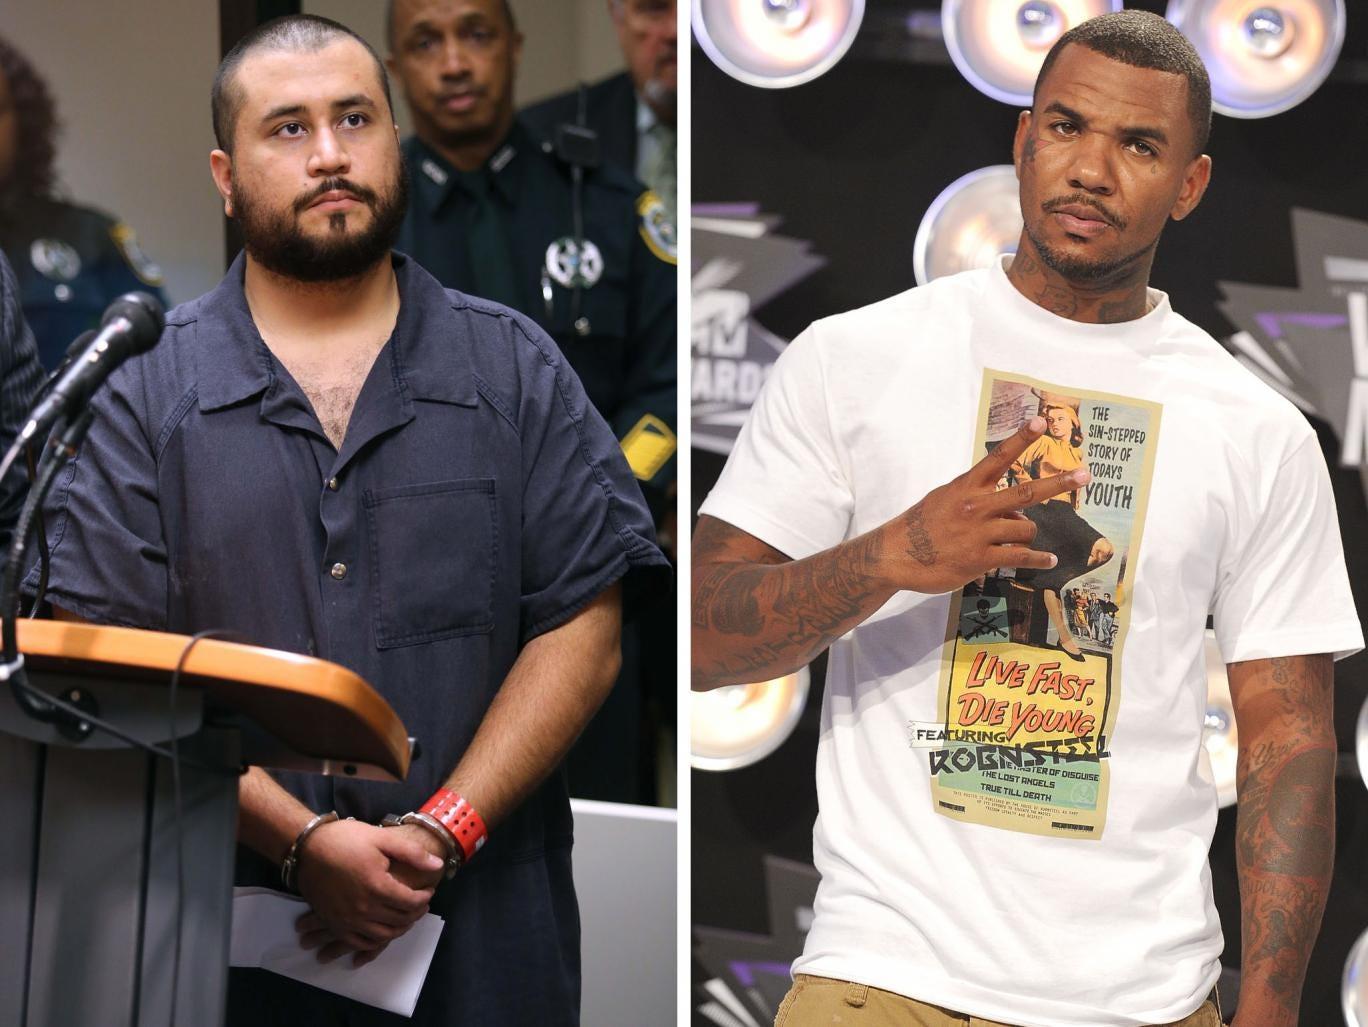 George Zimmerman wants to box rapper DMX, but no ... - CNN